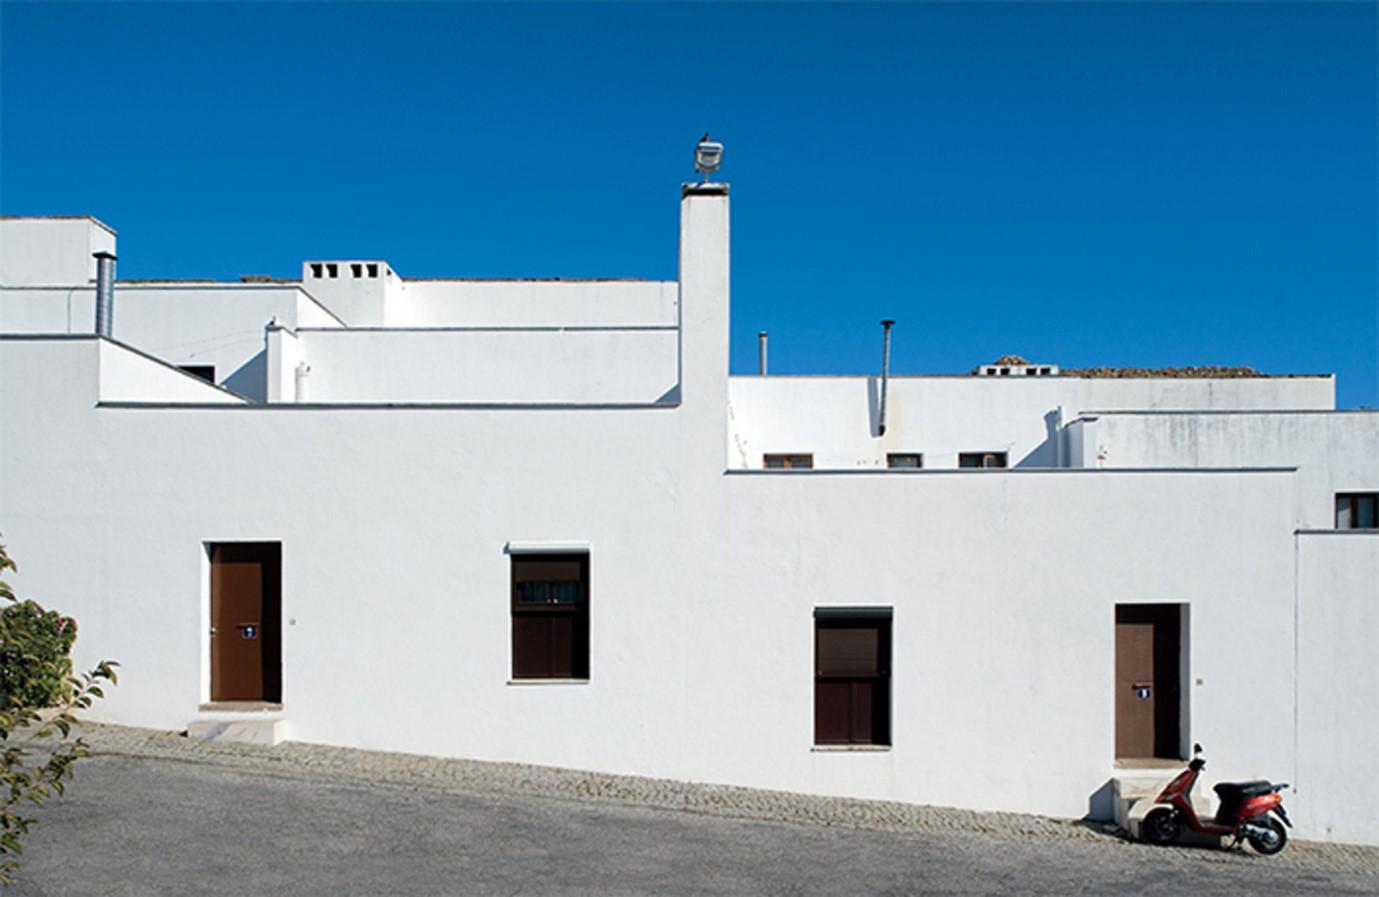 The Malagueira Housing Project, Alvaro Siza, 1977 - Sheet4